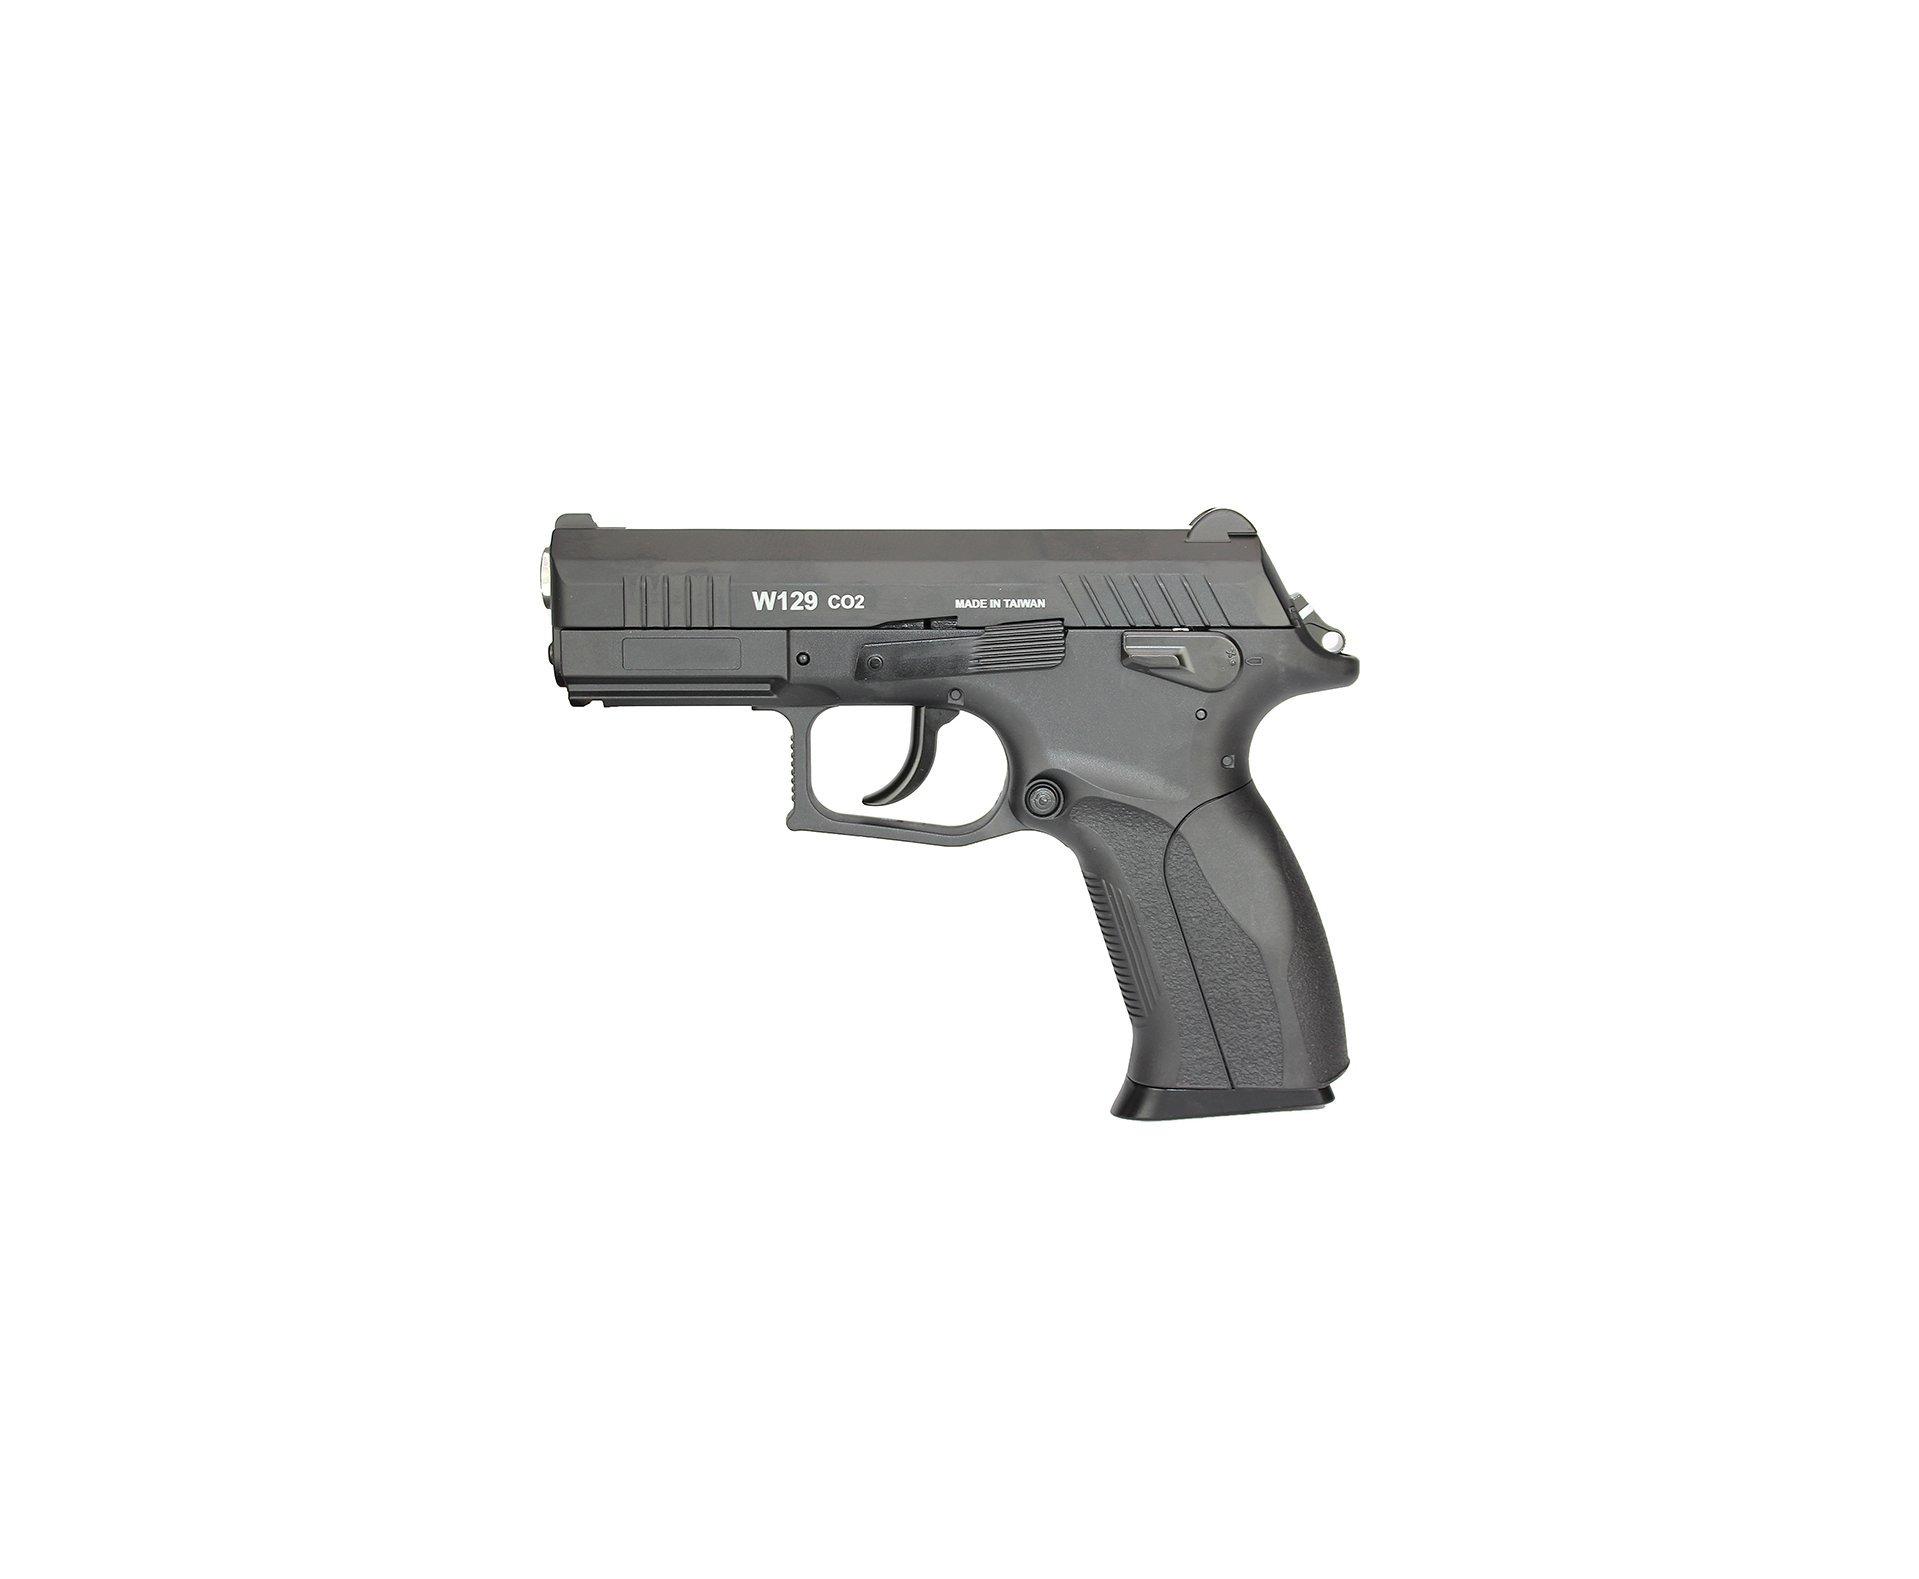 Pistola De Pressão Co2 Blowback Cz300 W129 Wingun 4,5mm